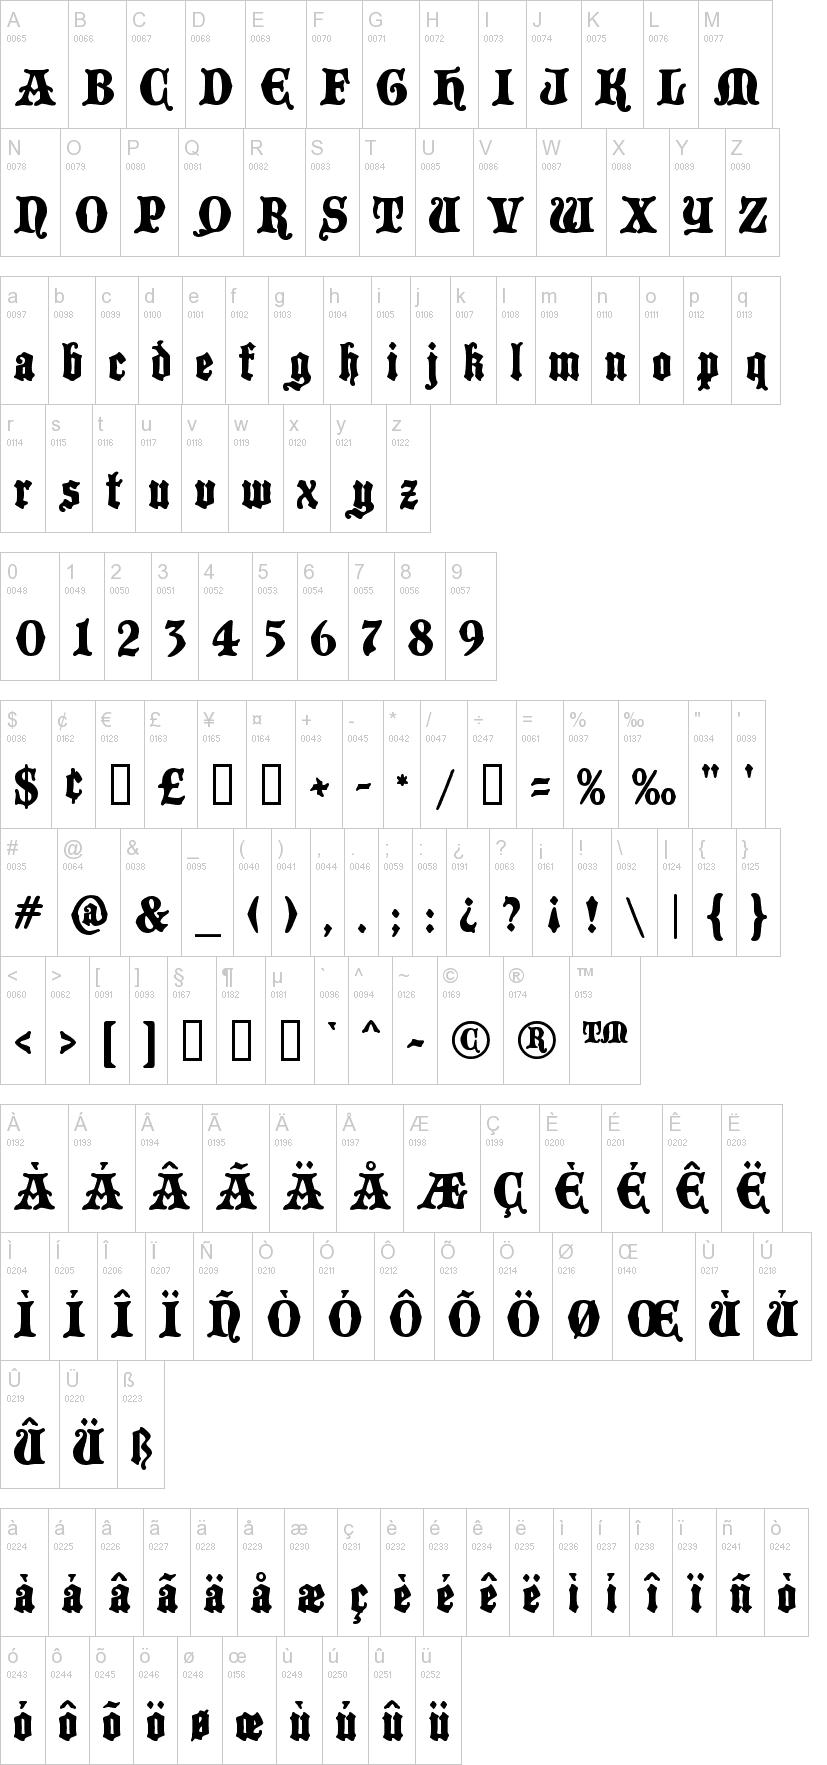 black castle font c : | fonts | pinterest | fuentes, negro y castillos